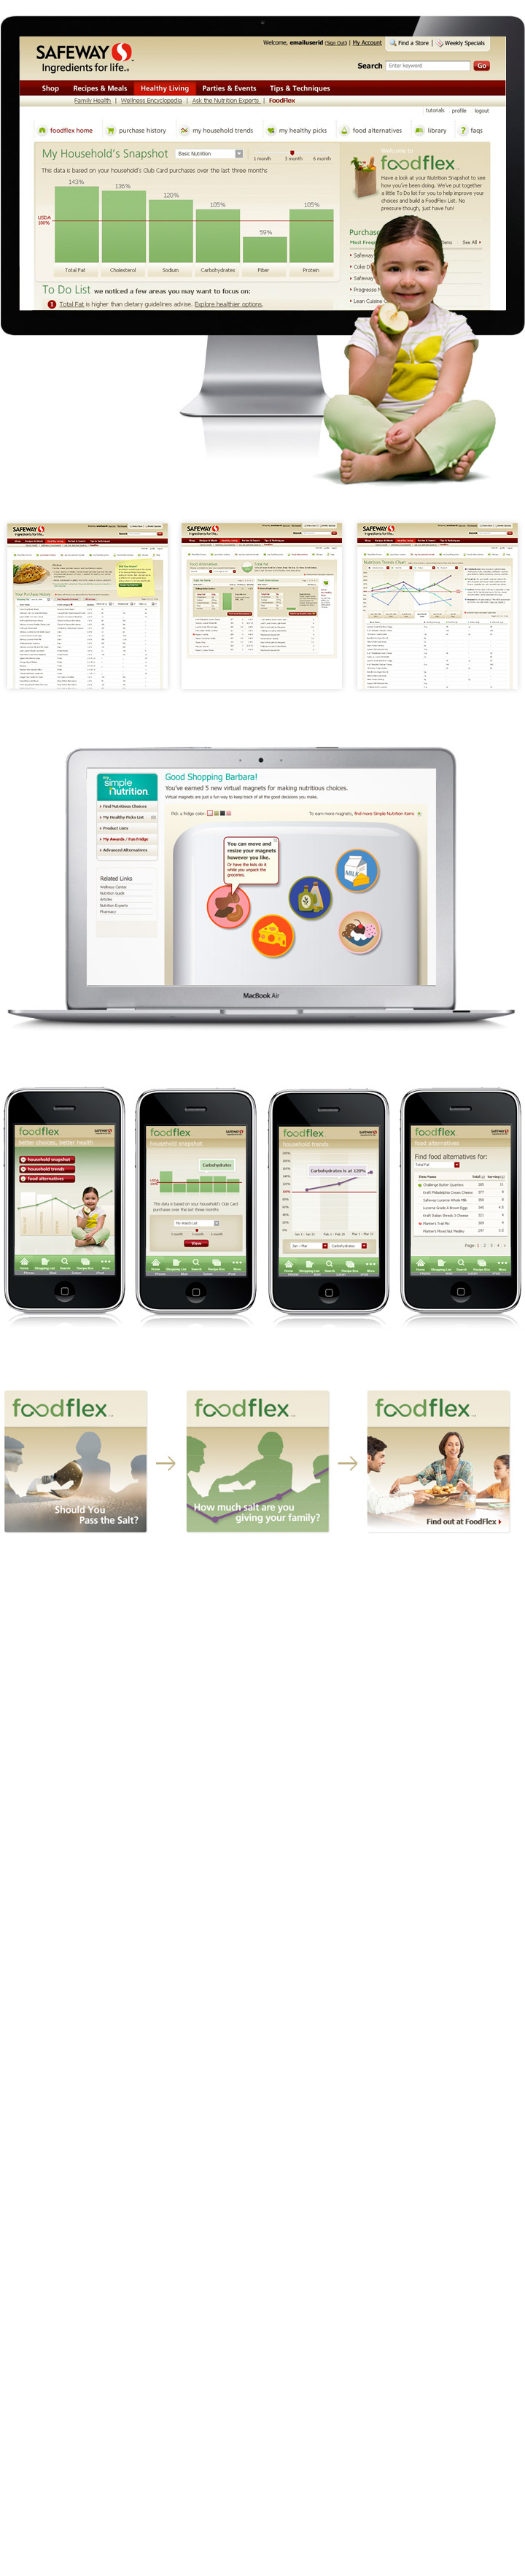 foodflex